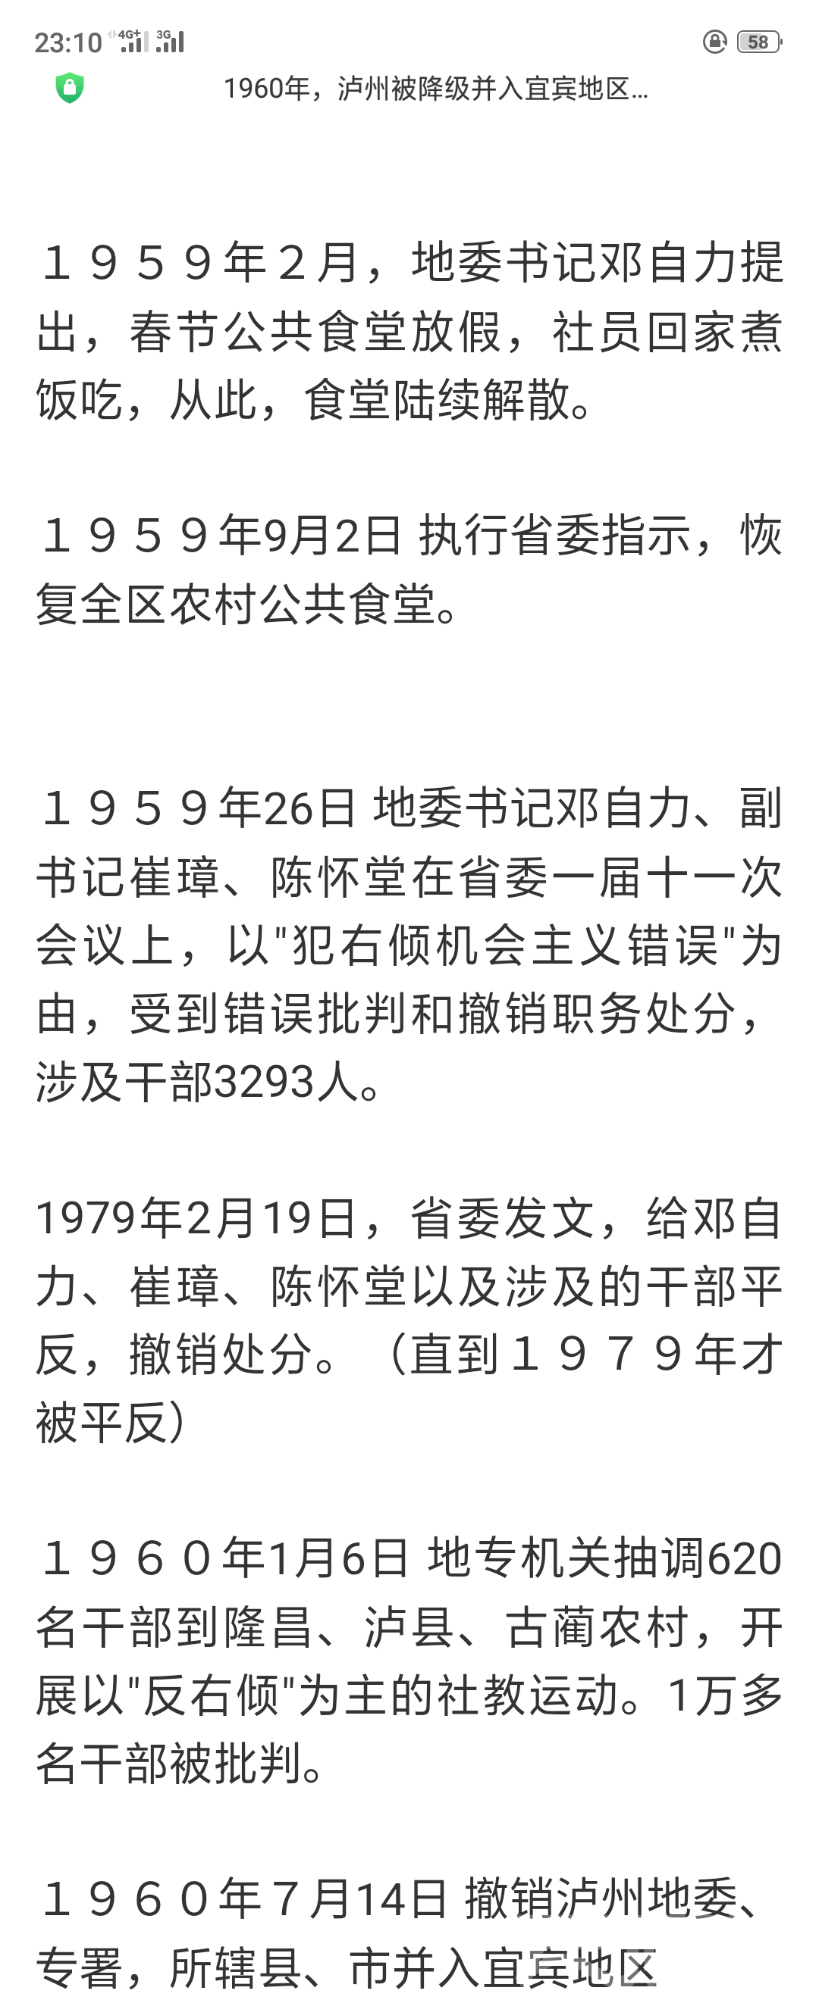 Screenshot_2019-02-13-23-10-14-41.png